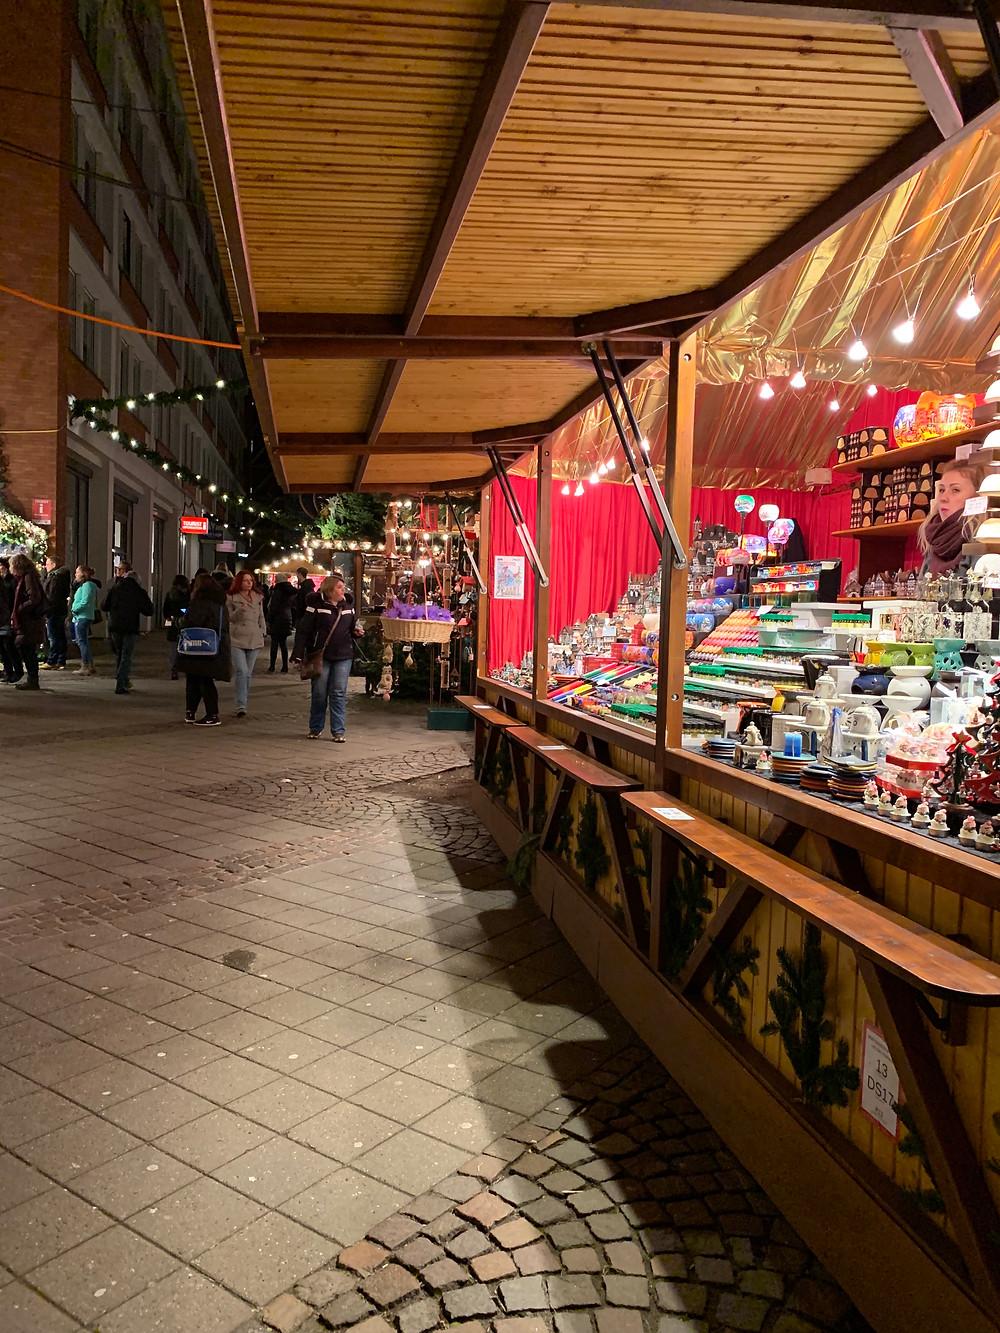 Aegidii Christmas Market in Munster